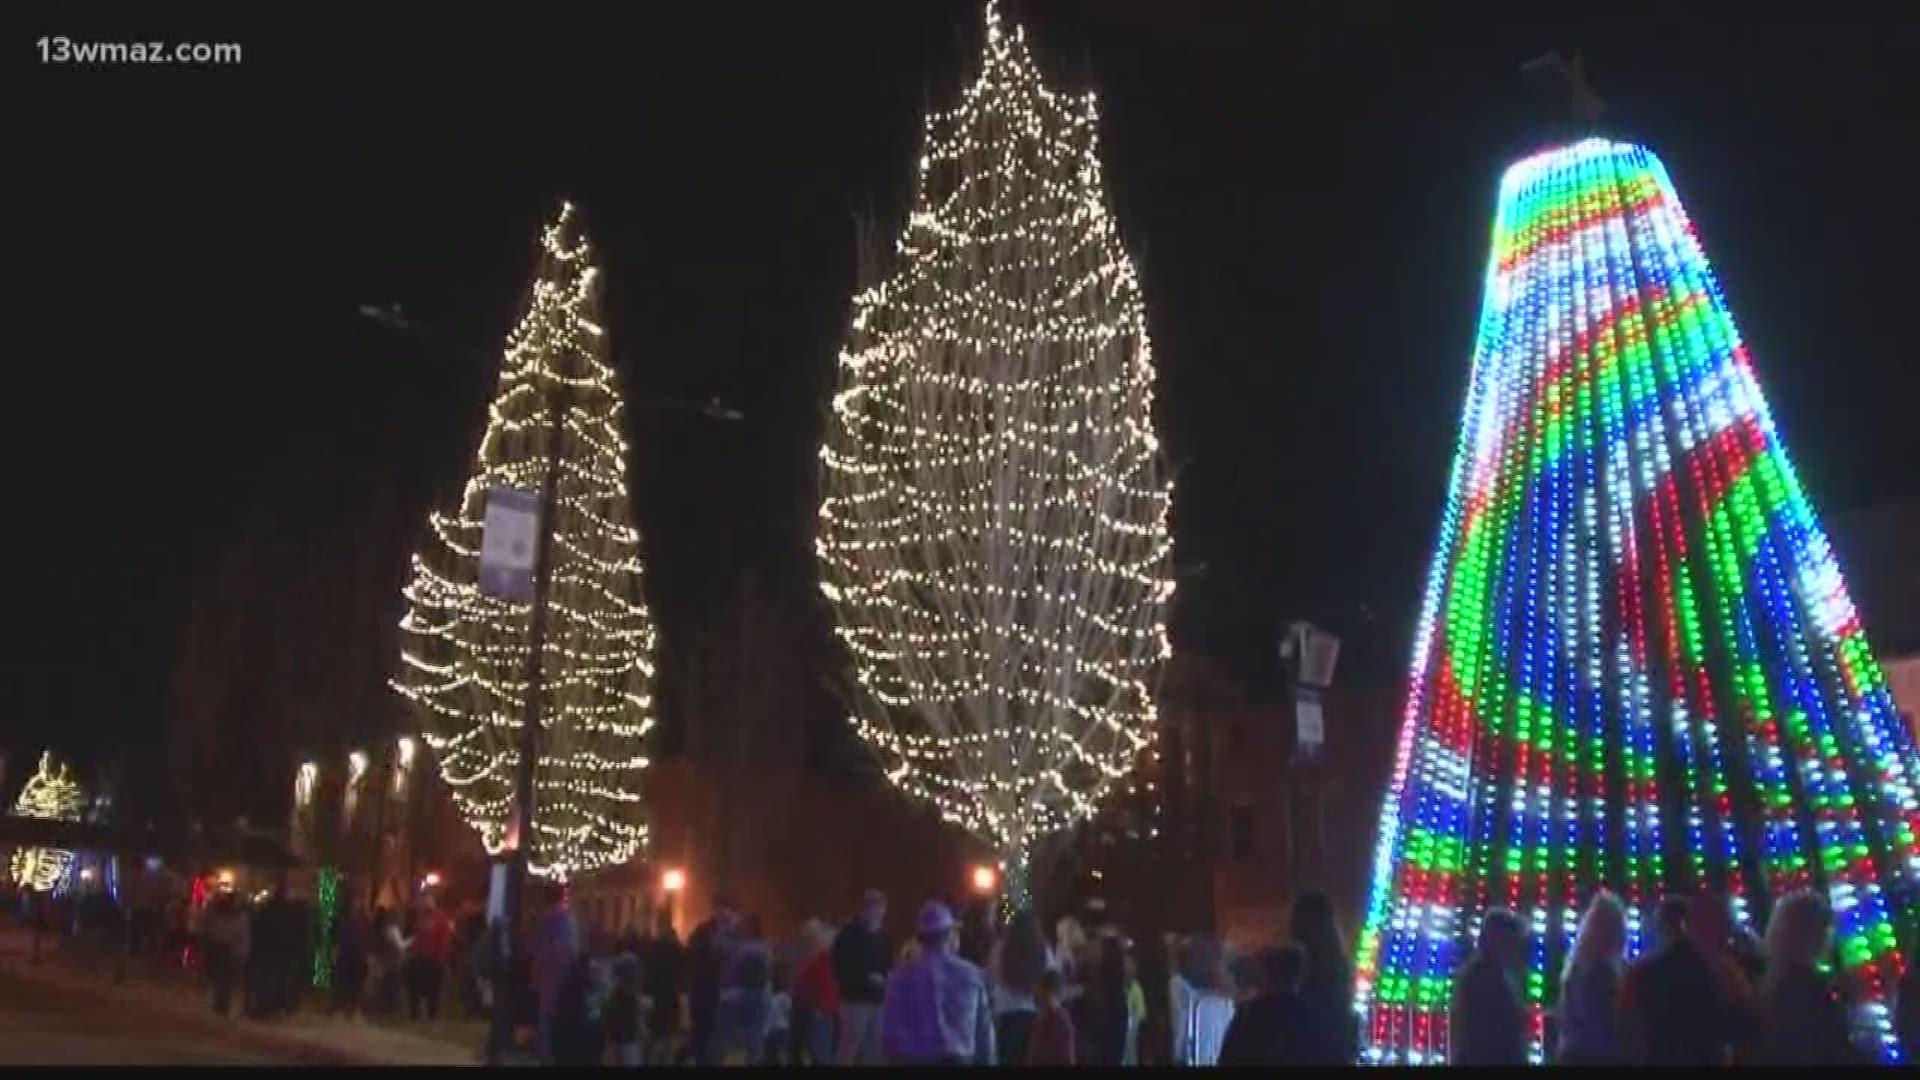 Dallas Cowboy Cheerleaders Christmas Extravaganza 2020 Macon says goodbye to Christmas lights display | khou.com